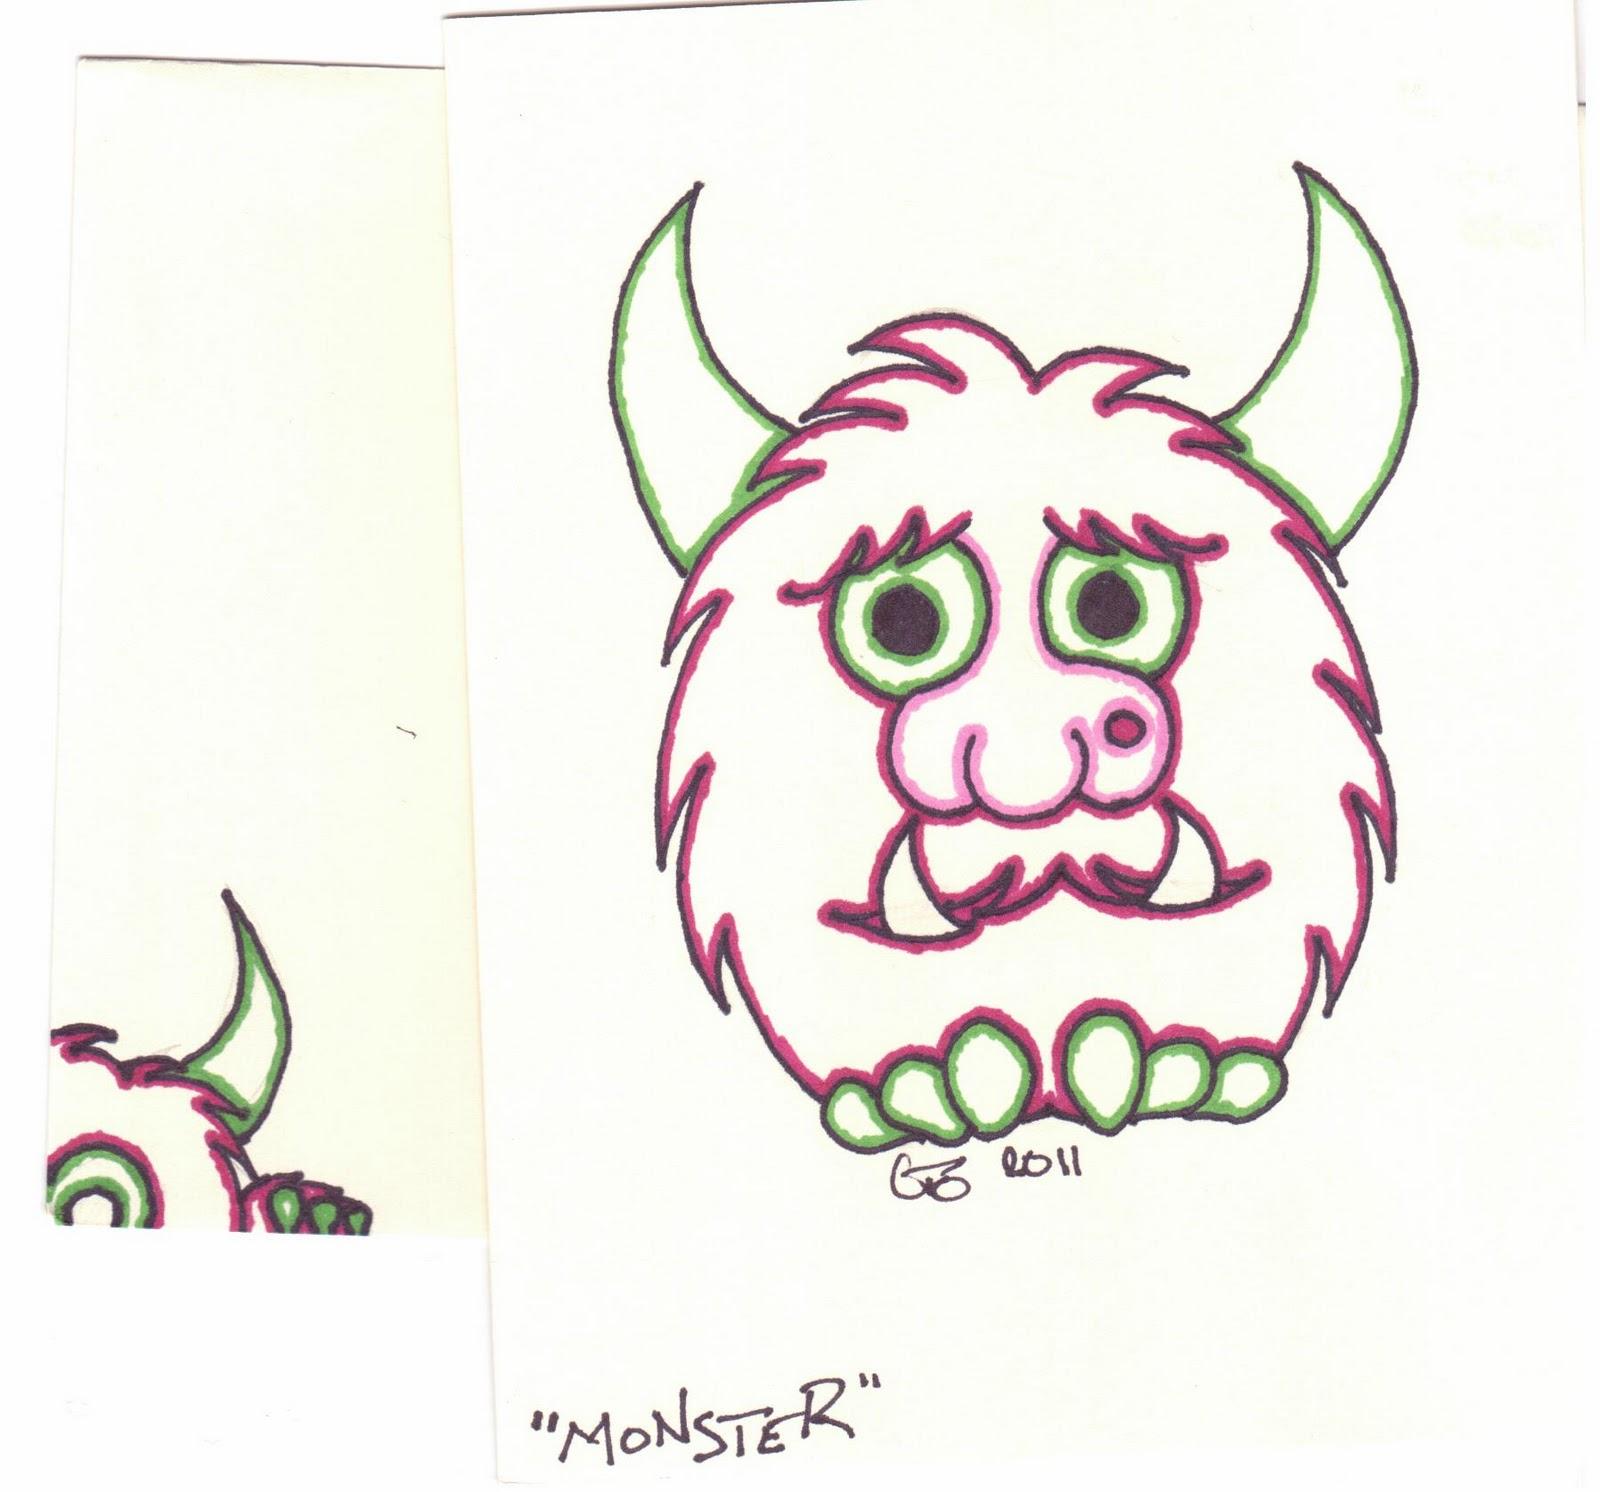 http://1.bp.blogspot.com/-haqI3AZHtbU/TtCKkdYSLVI/AAAAAAAAAX4/VlgHmRNy9qk/s1600/9+Monster+001.jpg